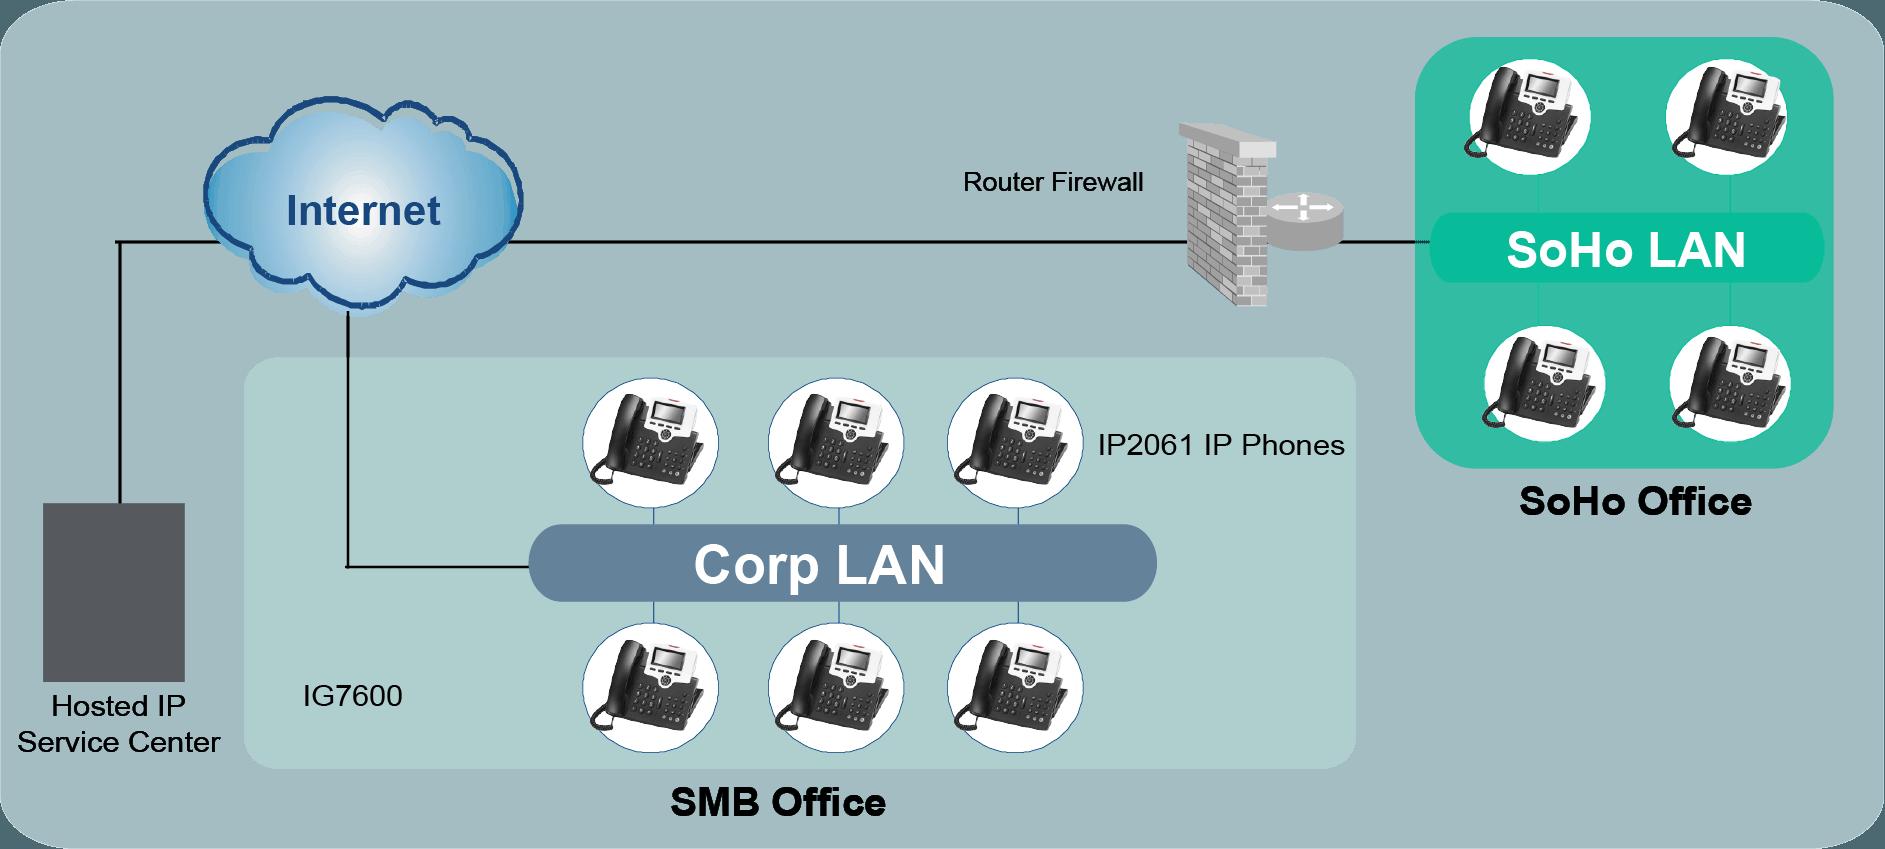 IP2061_configuration-min